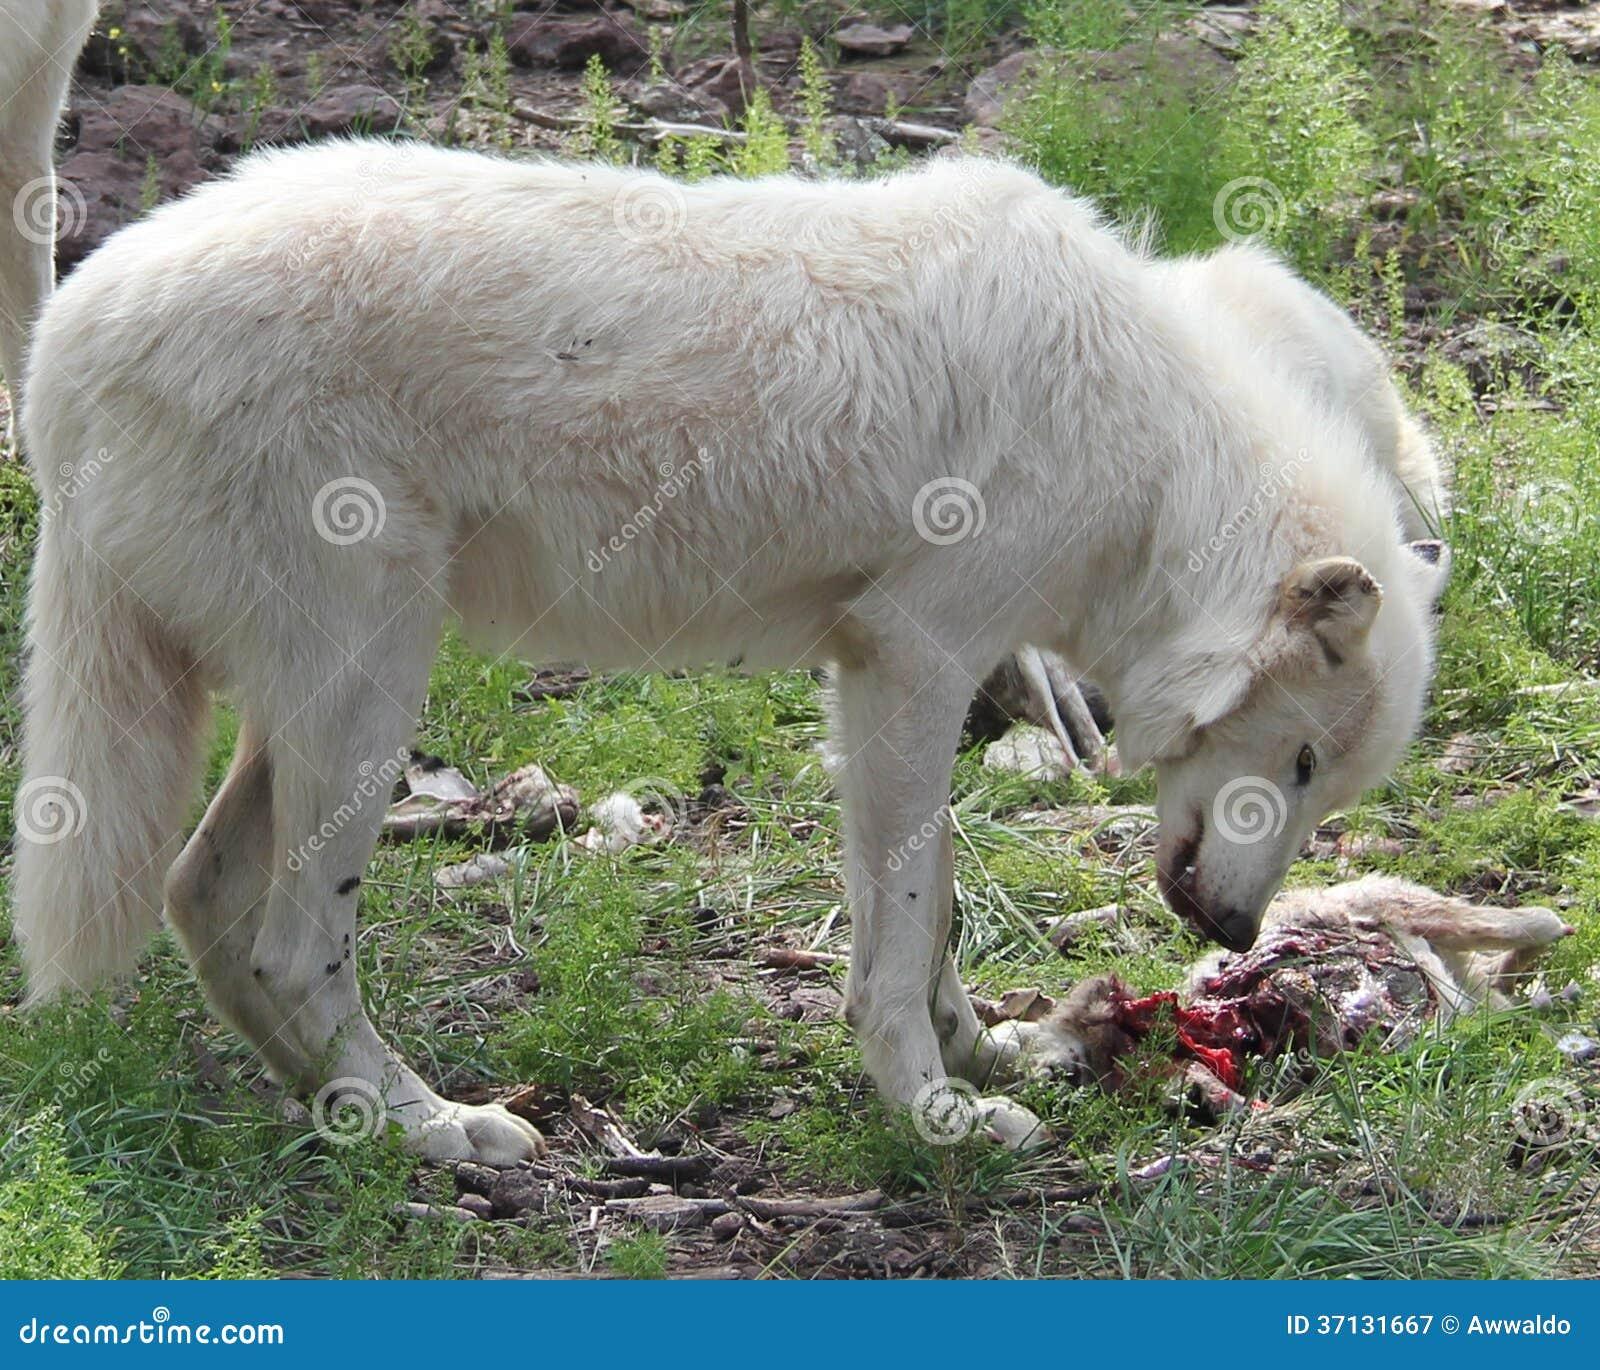 Wolf eating rabbit - photo#12